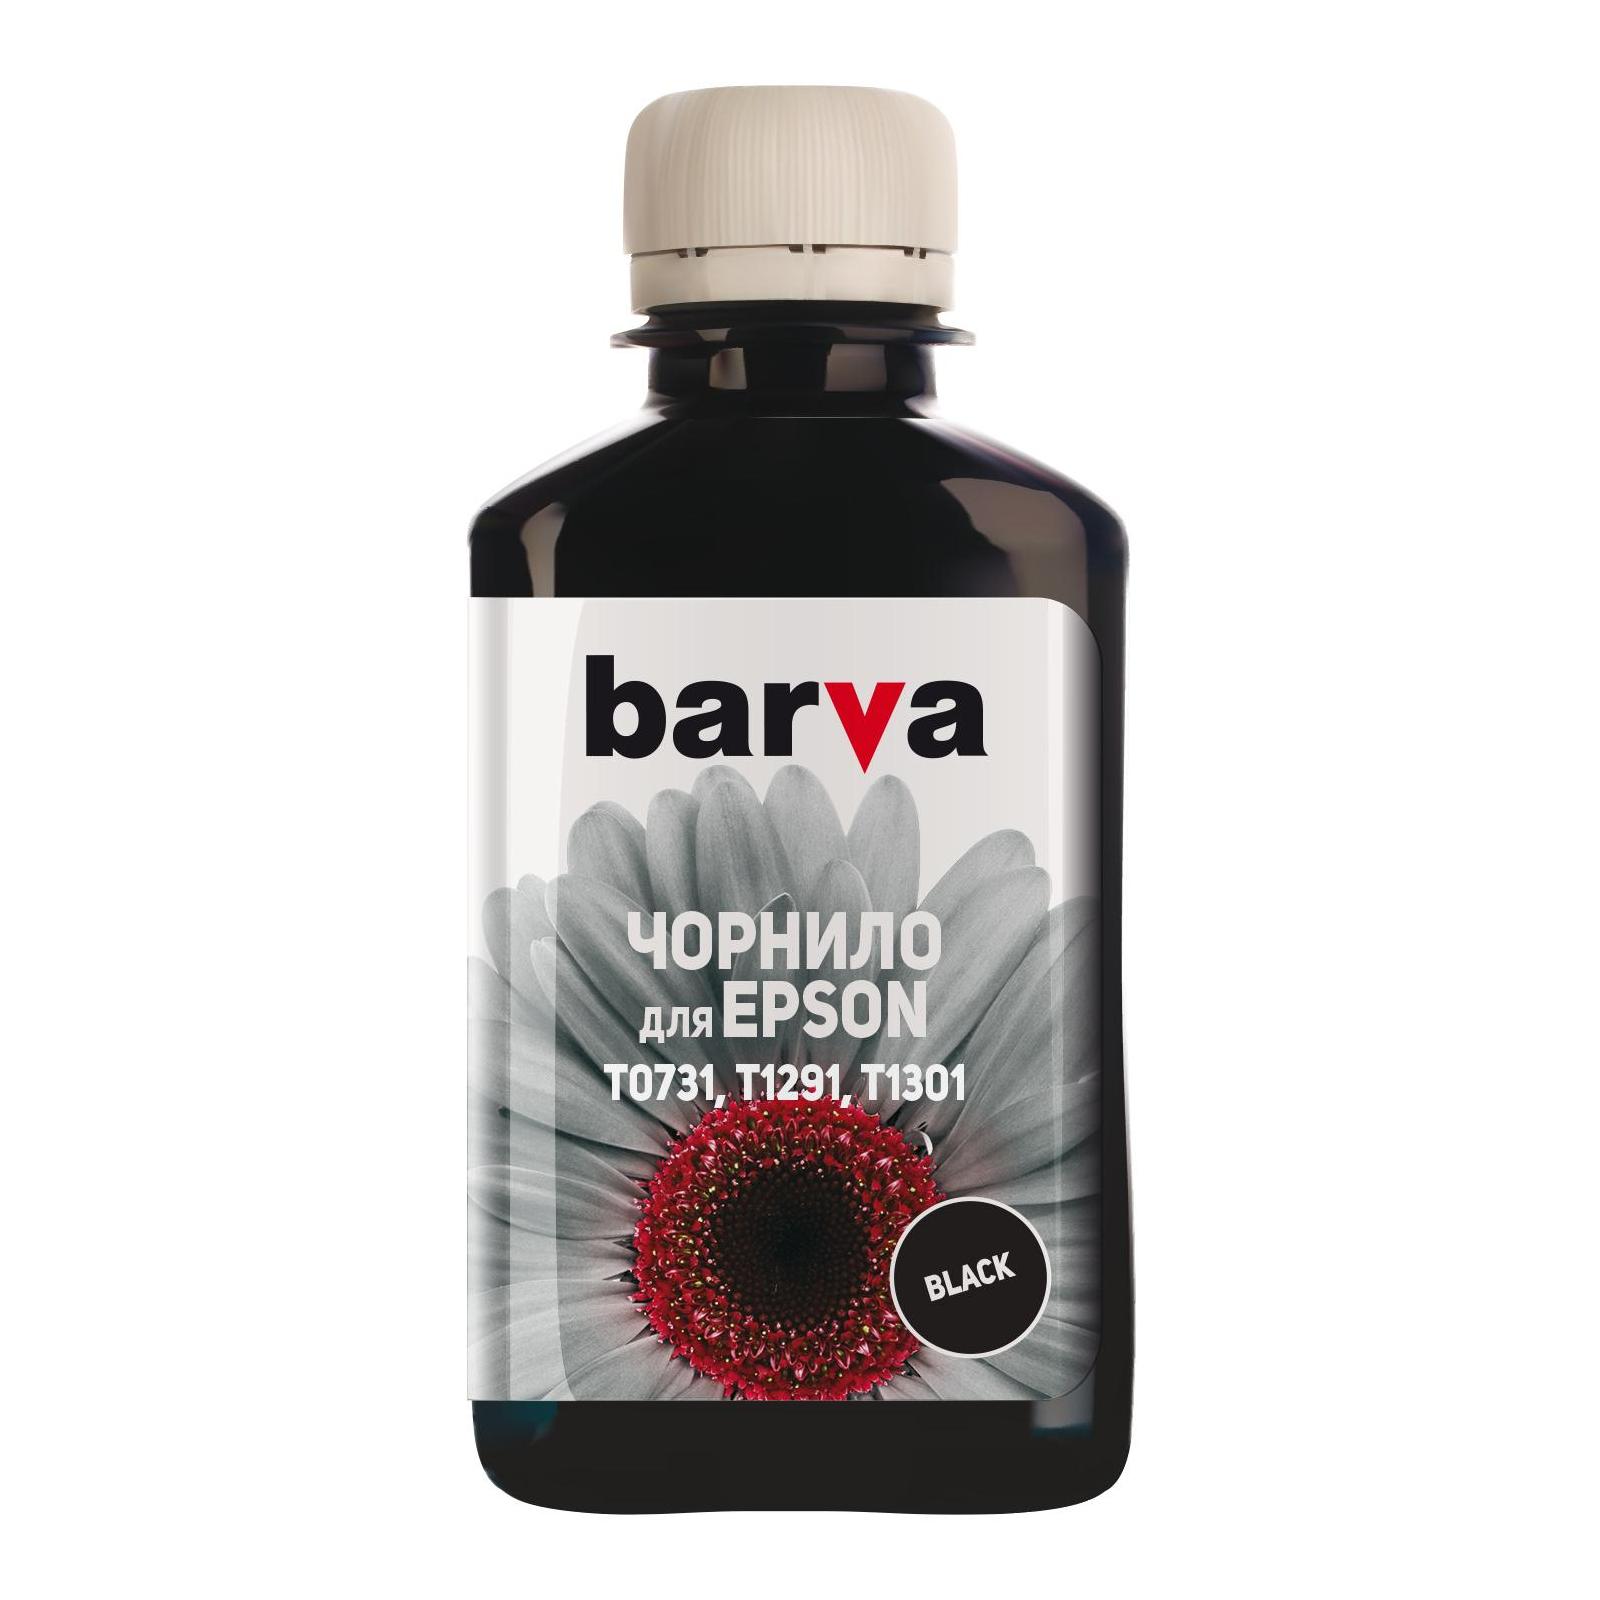 Чернила BARVA Epson T1301/T1291/T1281/T1031/T0731 Black 180 г pigm. (E130-535)